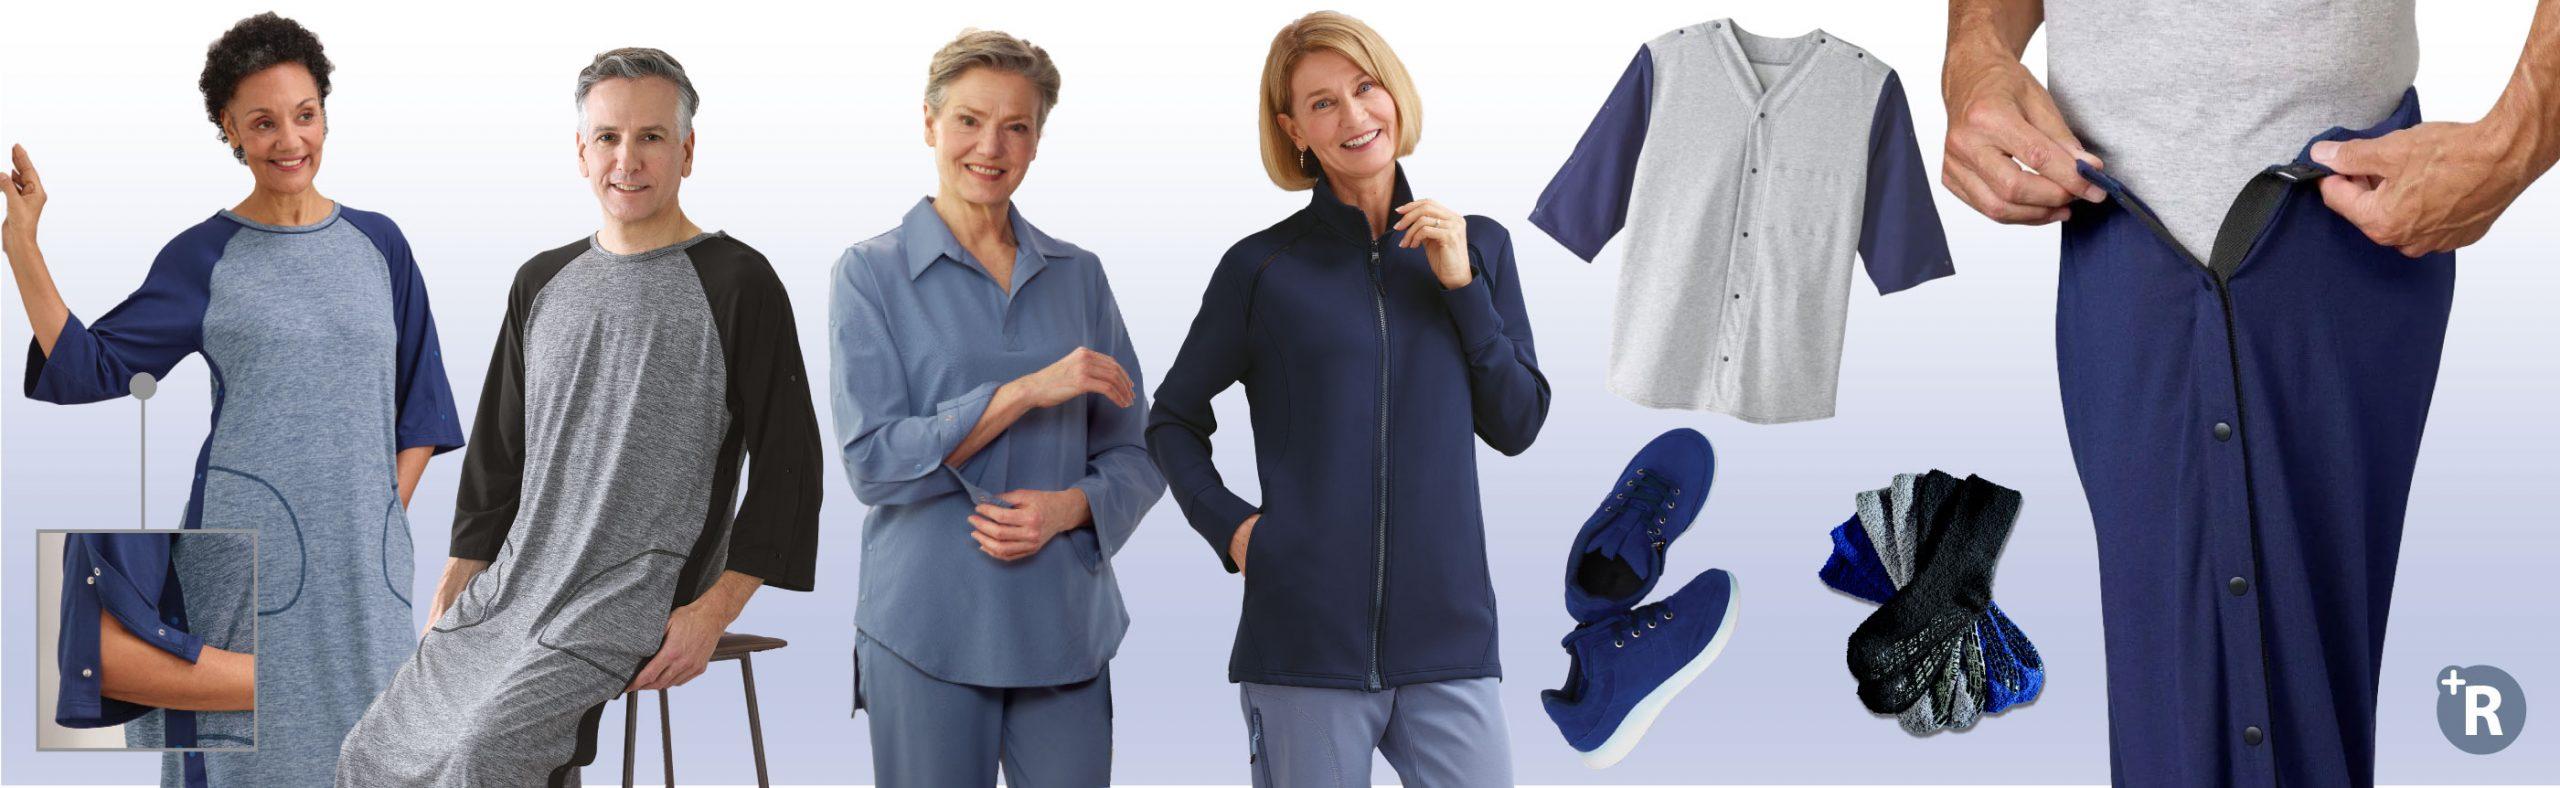 Rehabekleidung von Tamonda Pflegemode